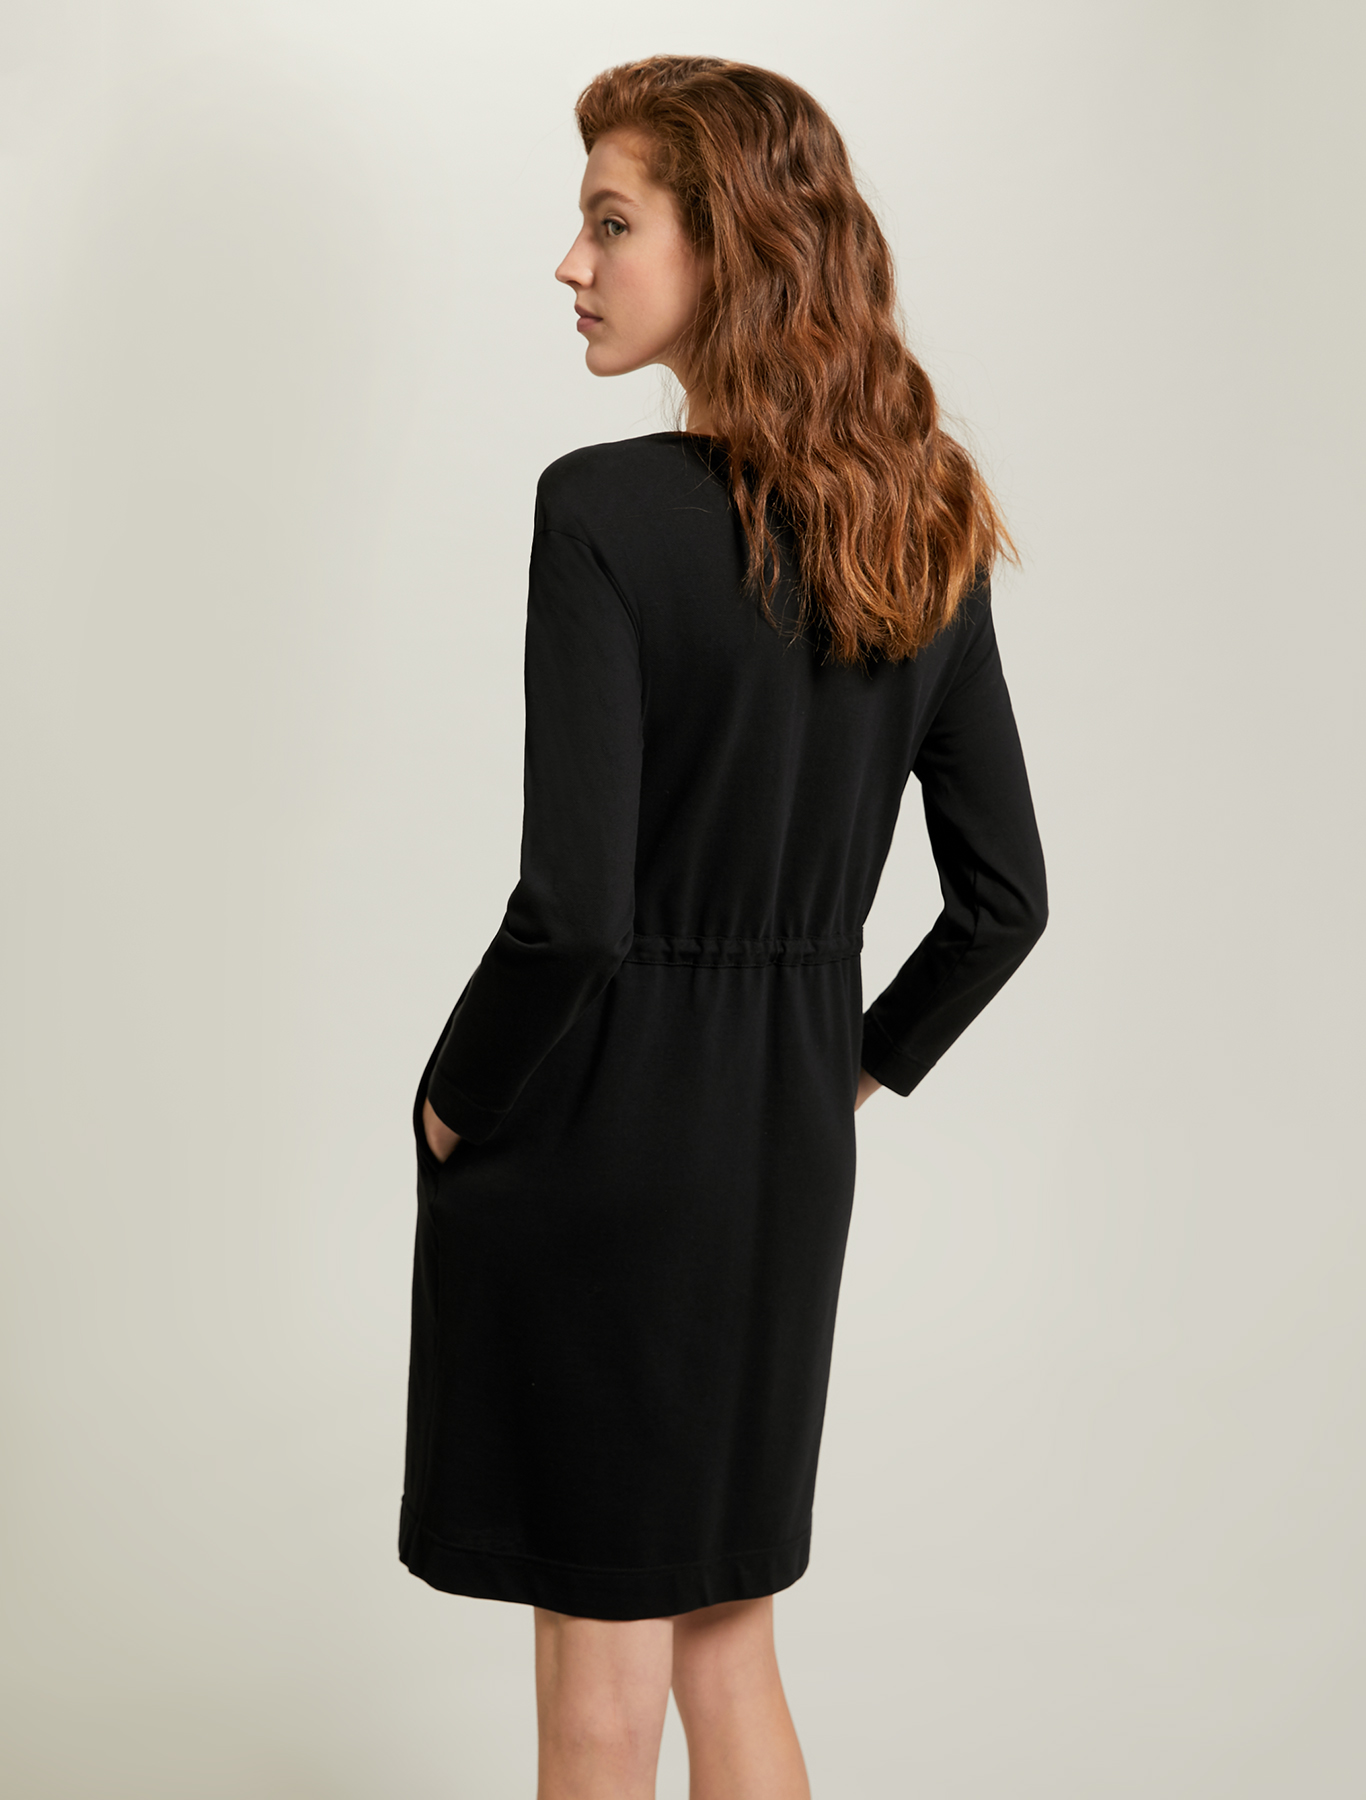 Piqué jersey dress - black - pennyblack